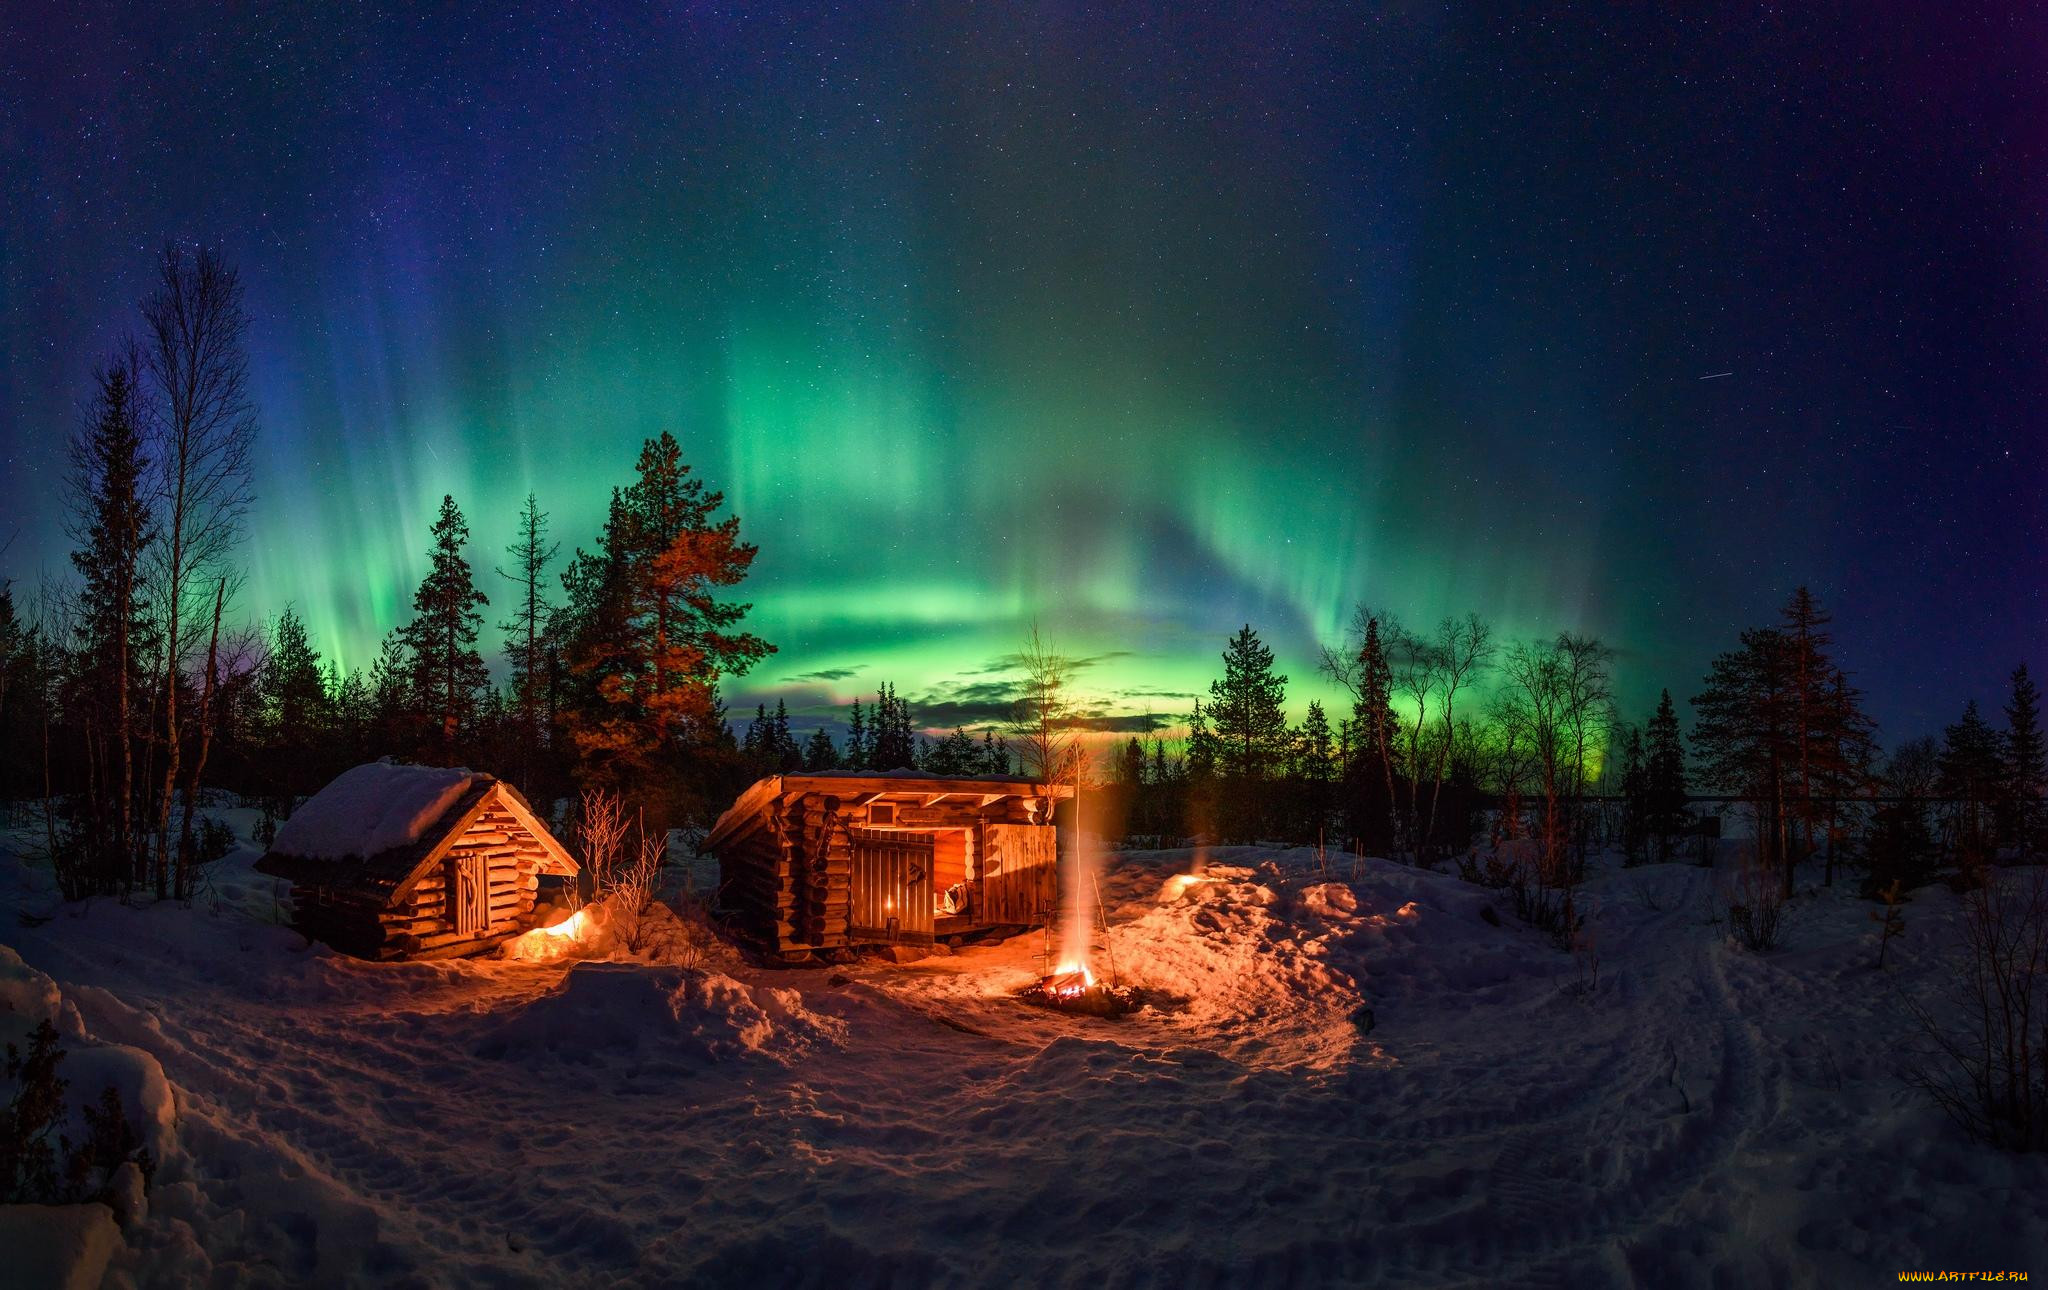 она съедала курорты зима лес картинки ночь числе удобств